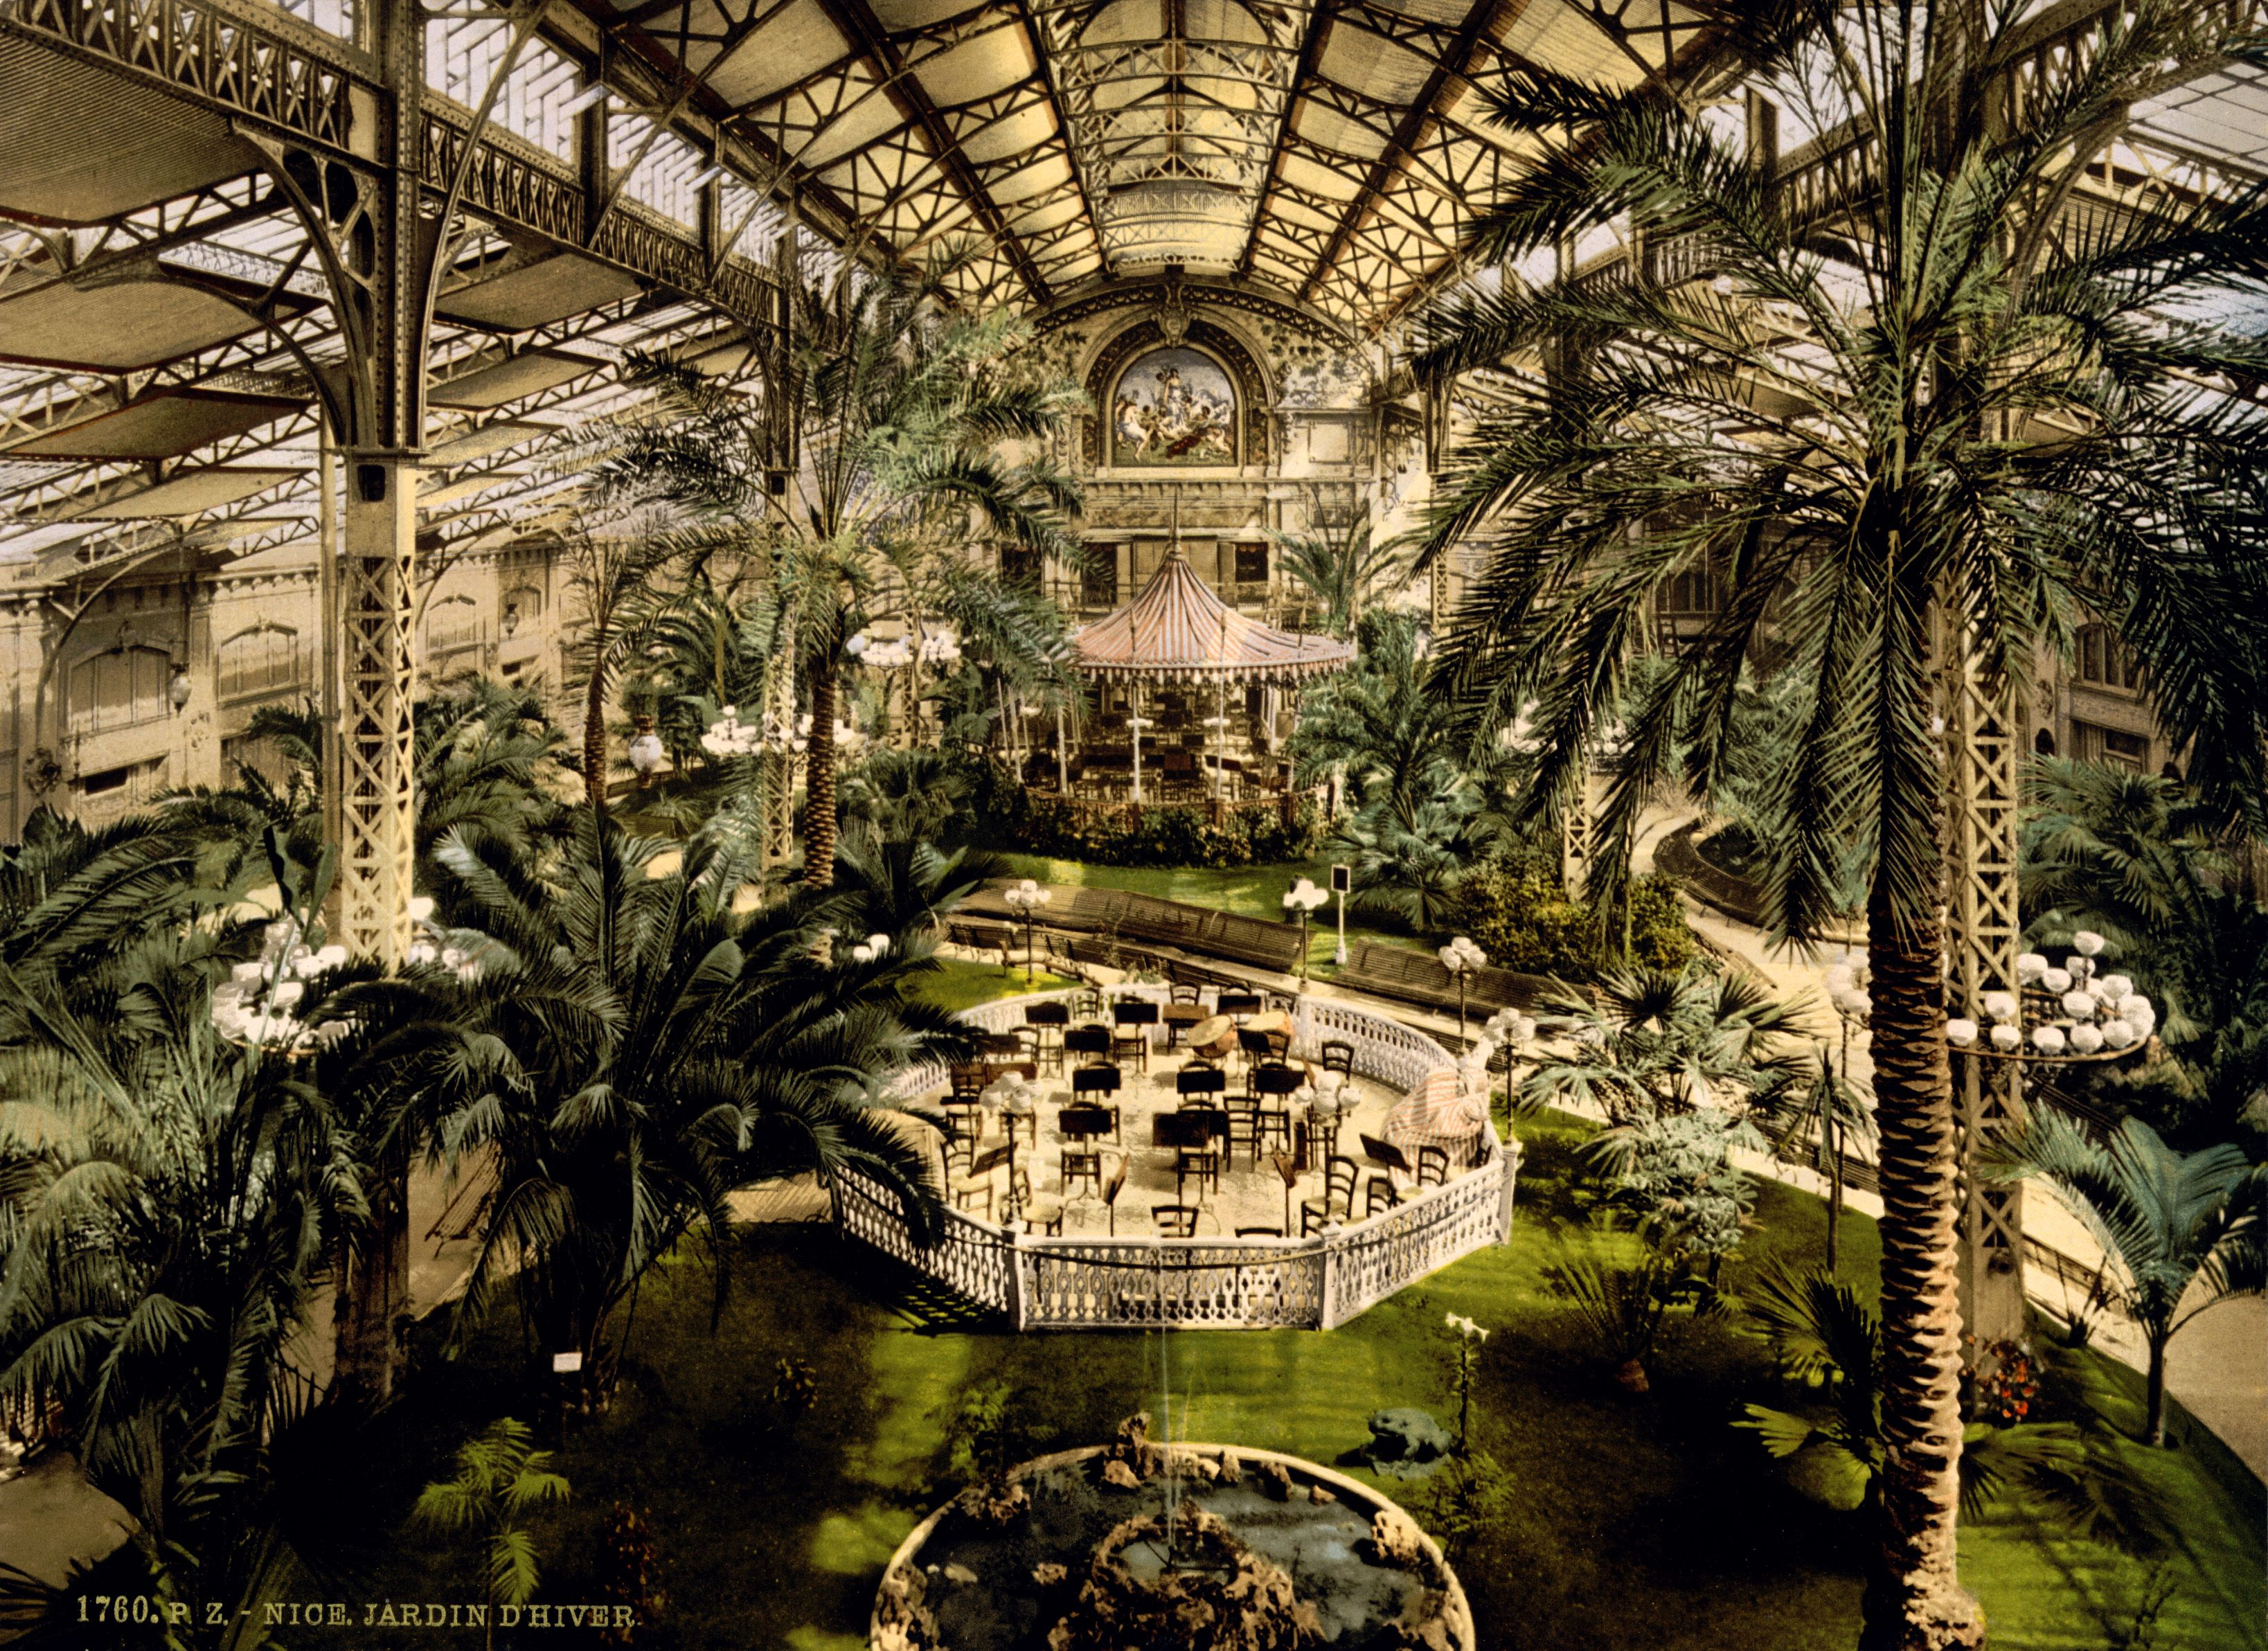 Jardin de l\'Hiver (Winter Garden), Nice/France | Places I\'ve Been ...